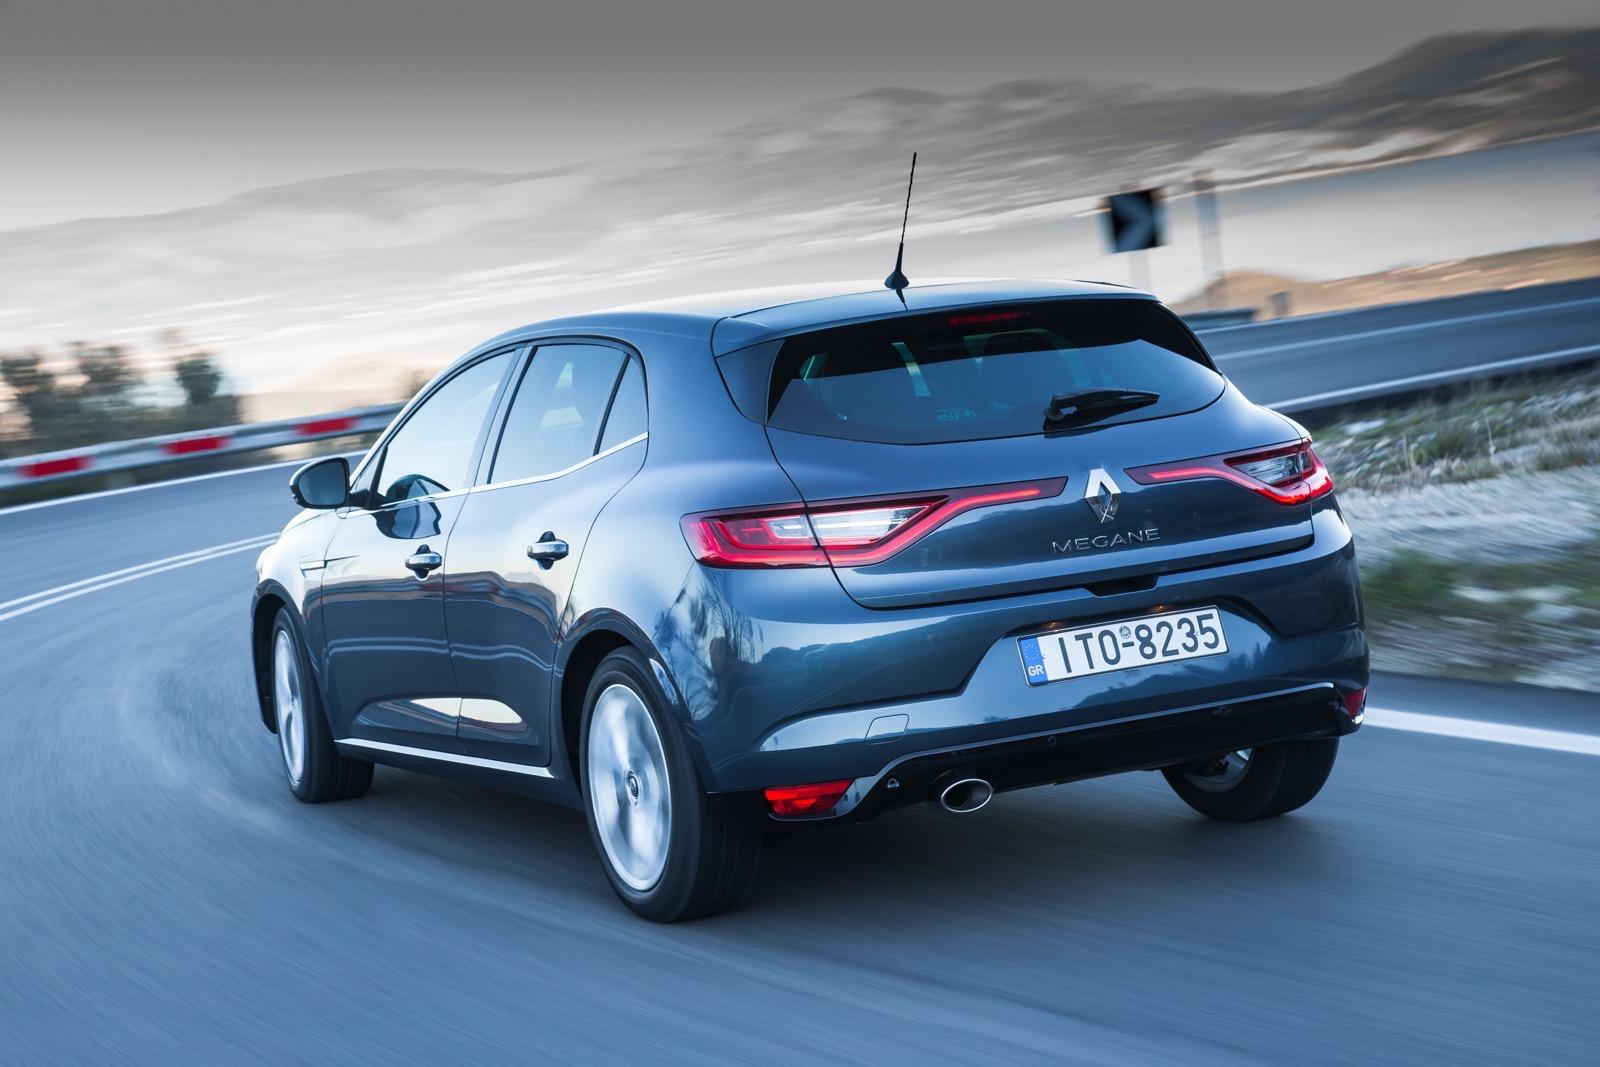 First_Drive_Renault_Megane_100